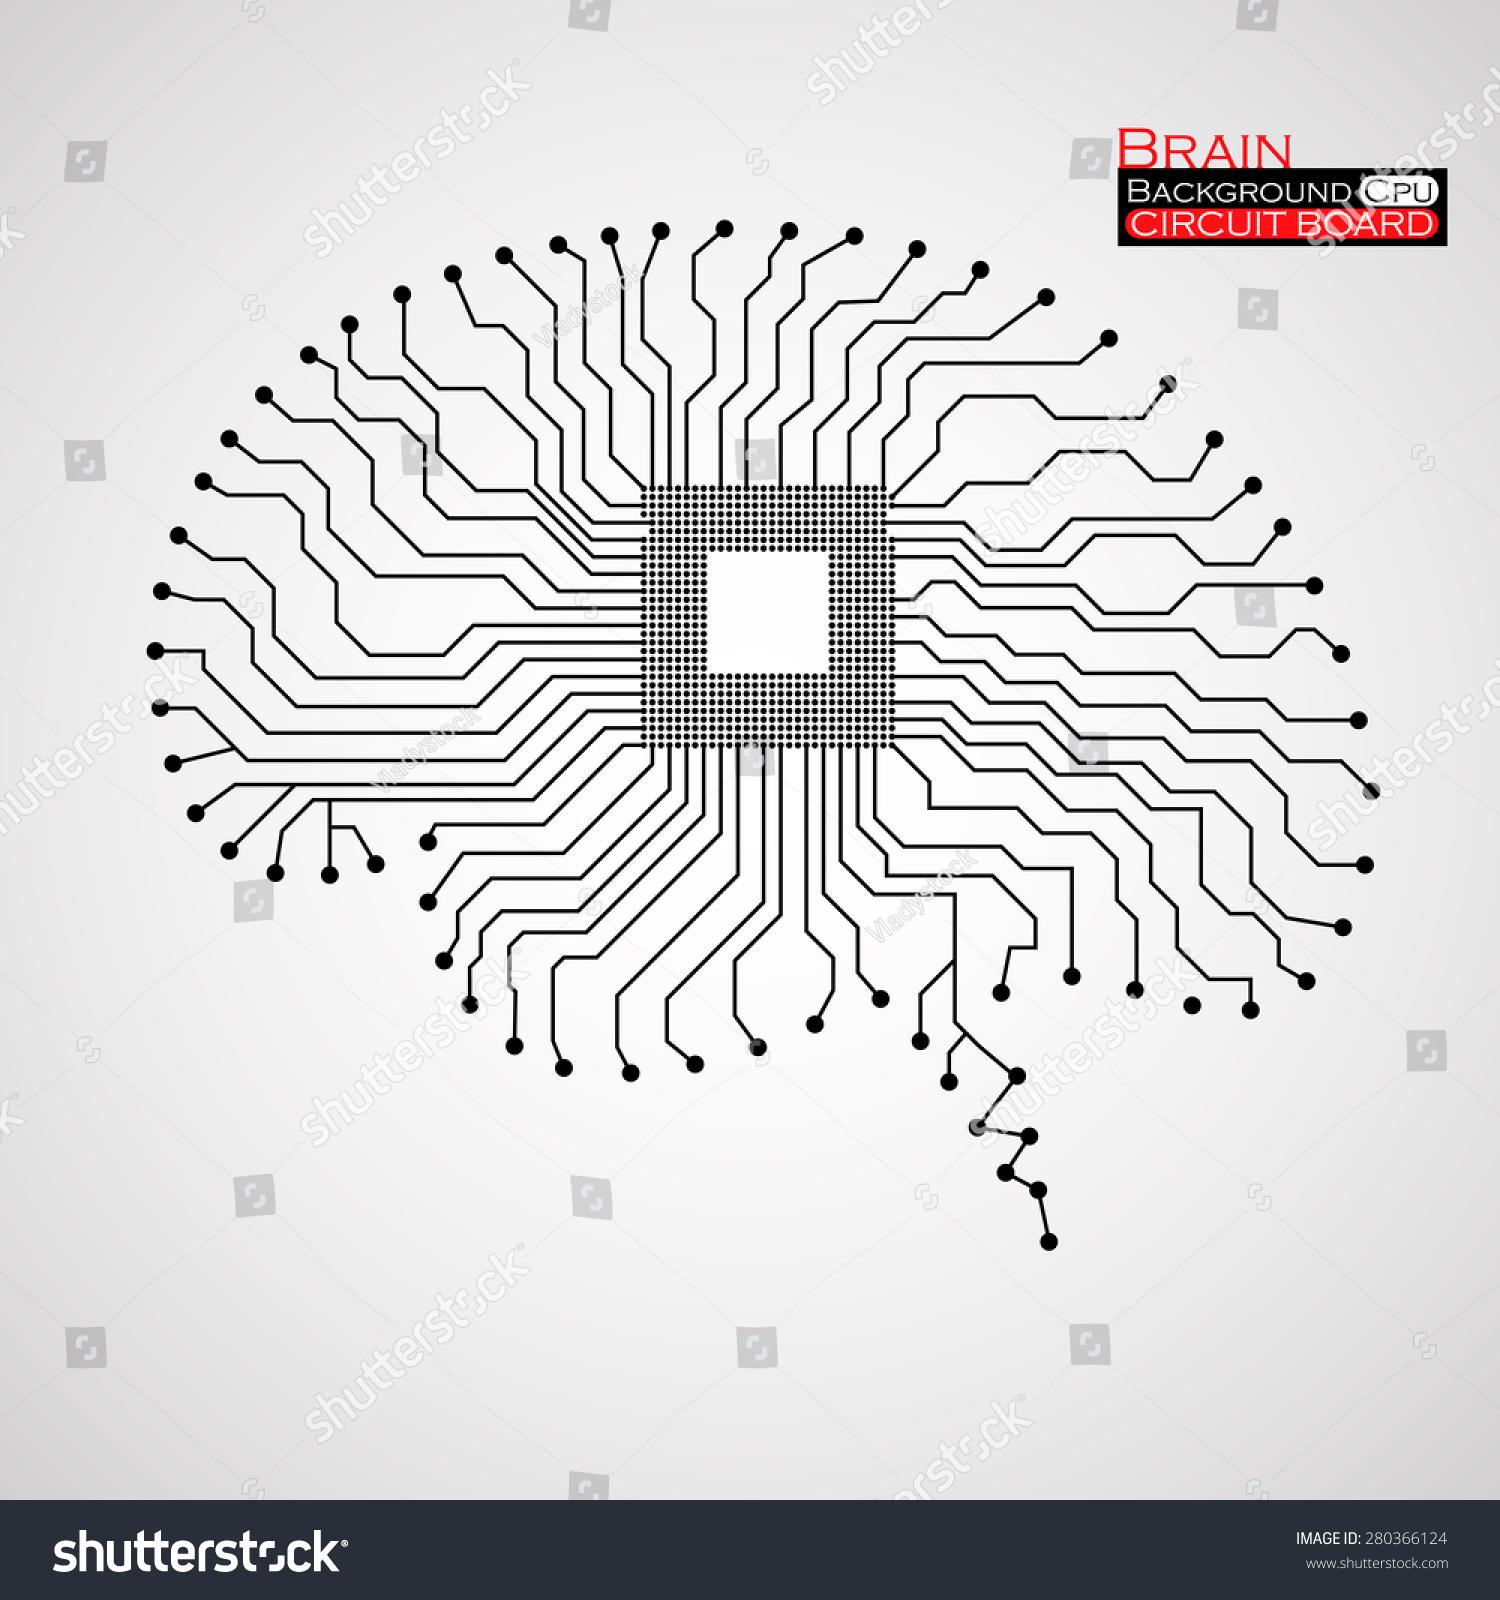 Circuit Board Vector Brain